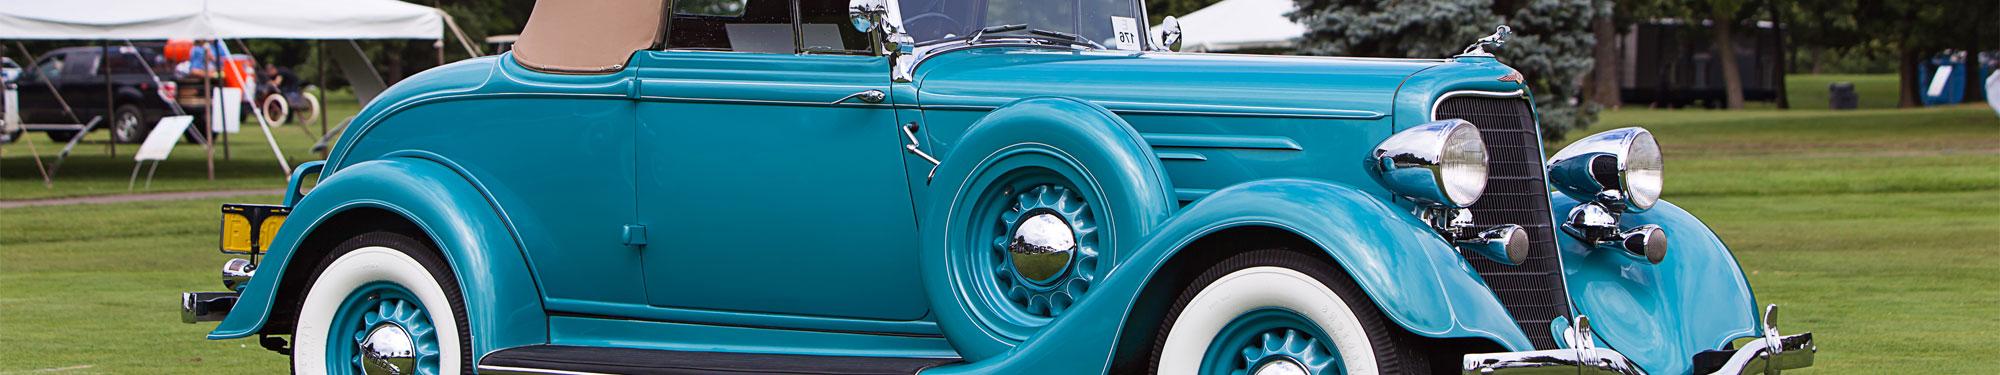 Car Collectors & Enthusiasts | Classic, Exotic, Vintage Car Transport